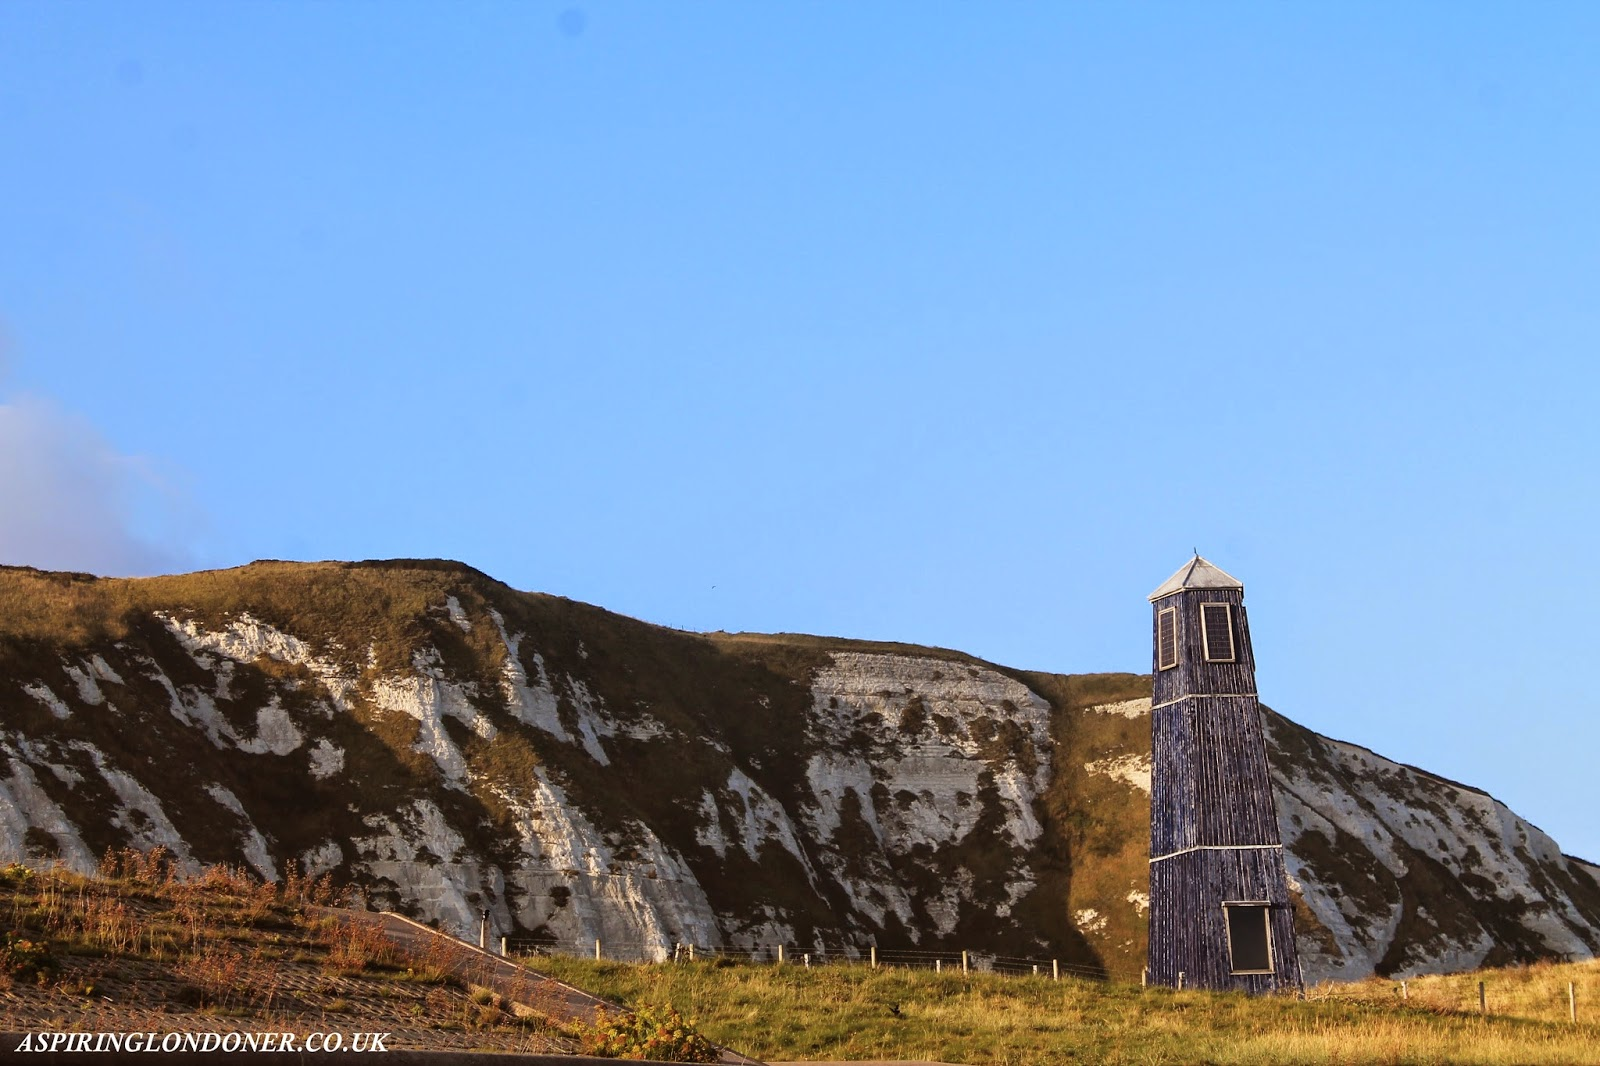 Samphire Hoe & Shakespeare Cliffs, Dover - Aspiring Londoner